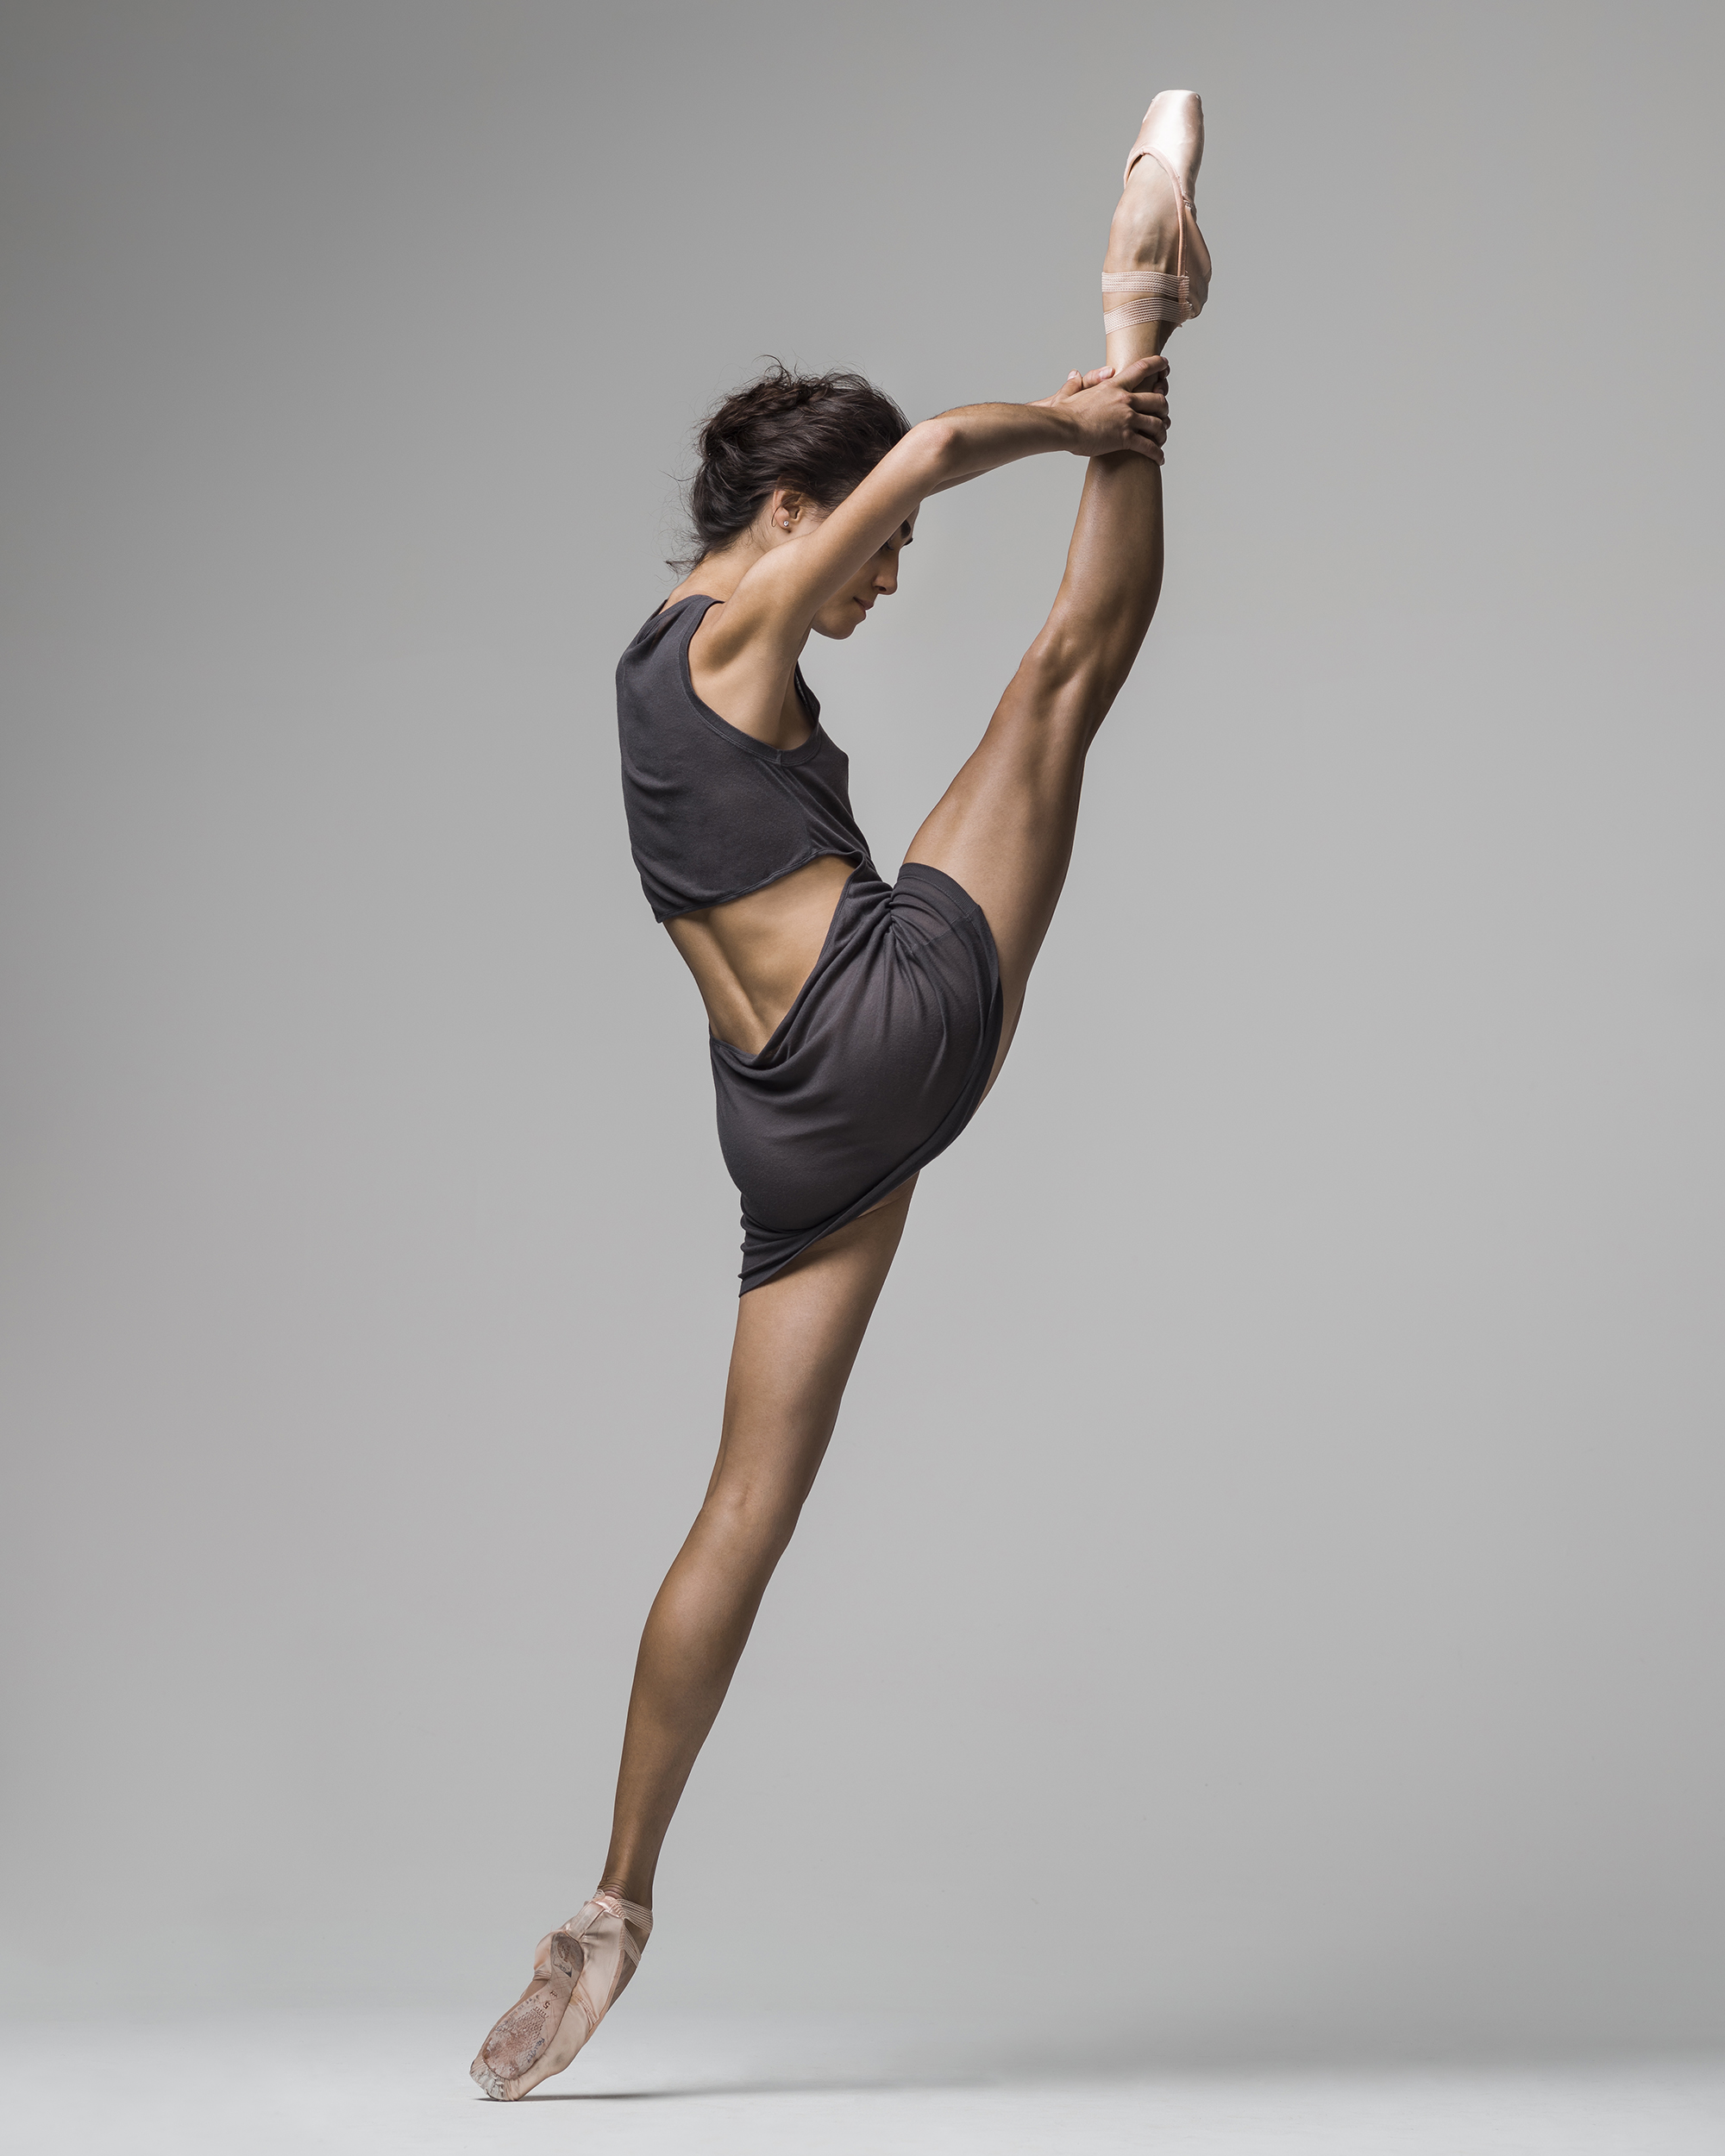 BalletStudio_Paris_6-26-201613512-s.jpg